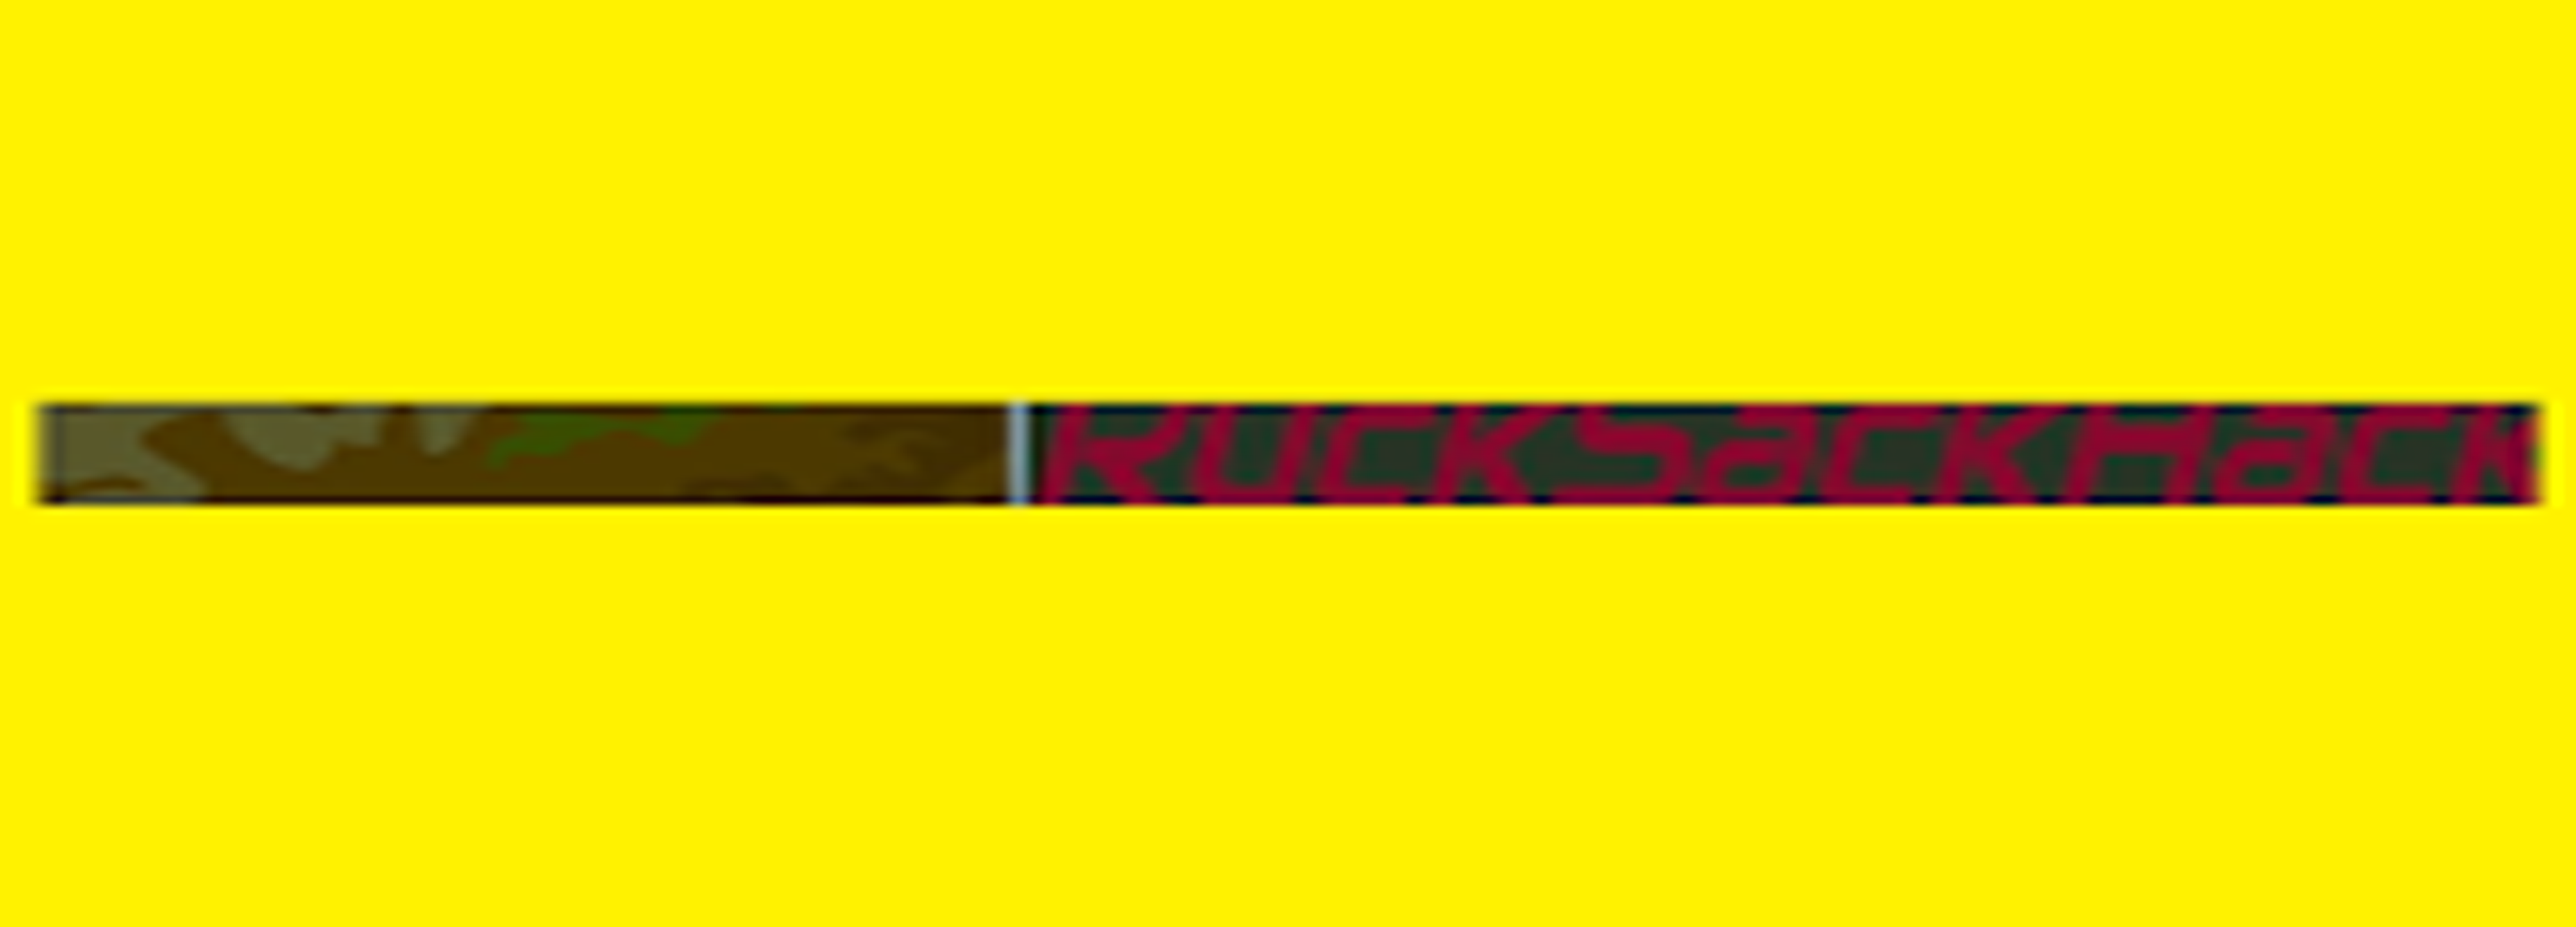 RuckSackHack Accelerator Program